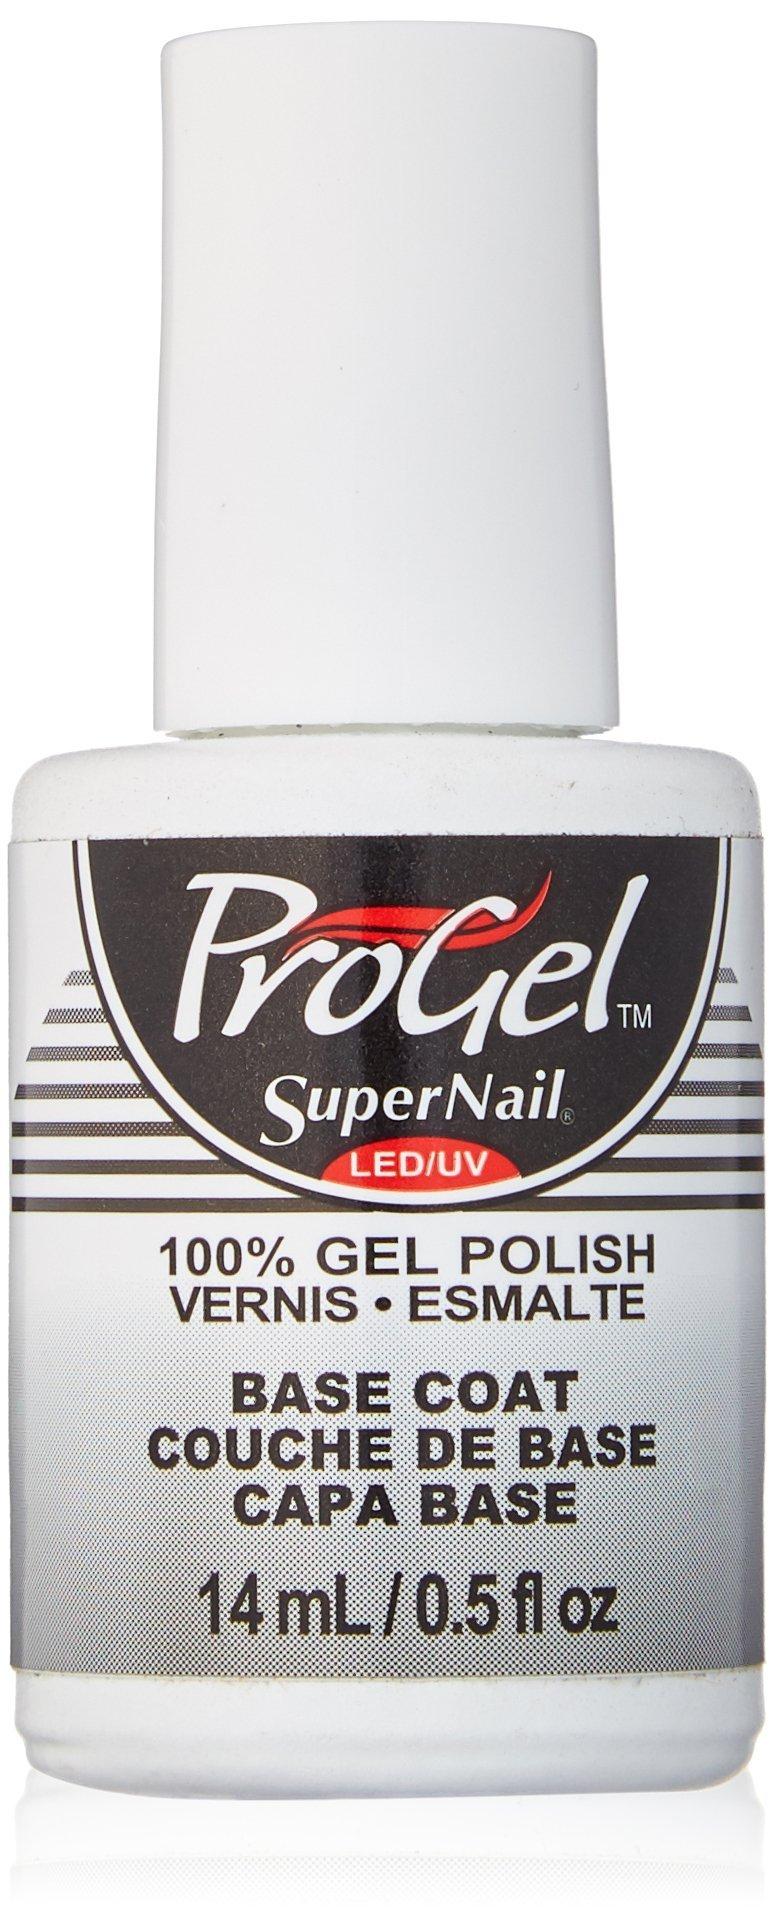 Amazon.com : Supernail Gel Polish for Nails, Paris Rose Creme, 0.5 ...